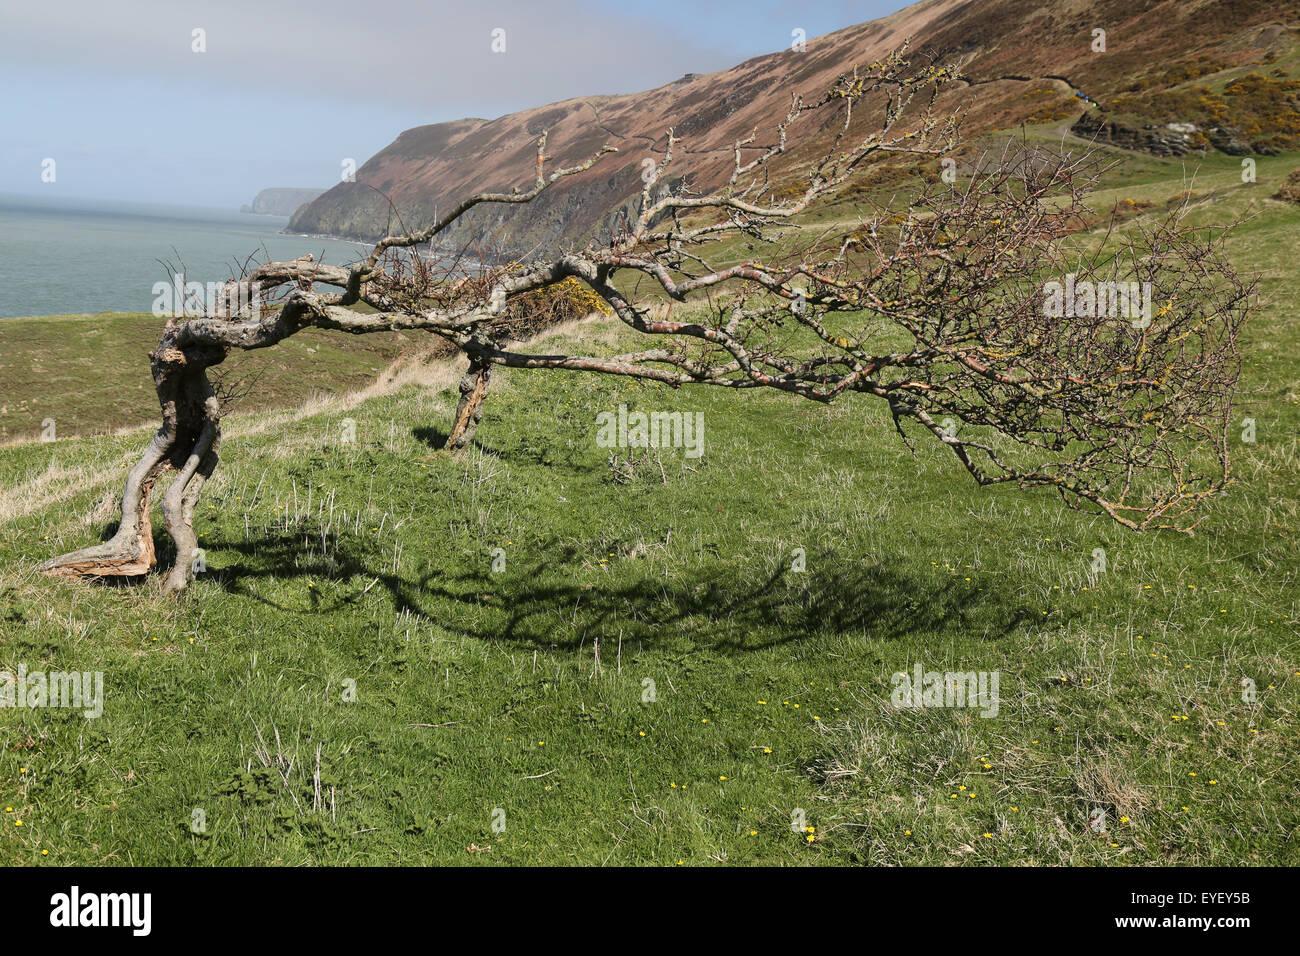 Cardigan Bay, Wales, Coast Path Tree - Stock Image